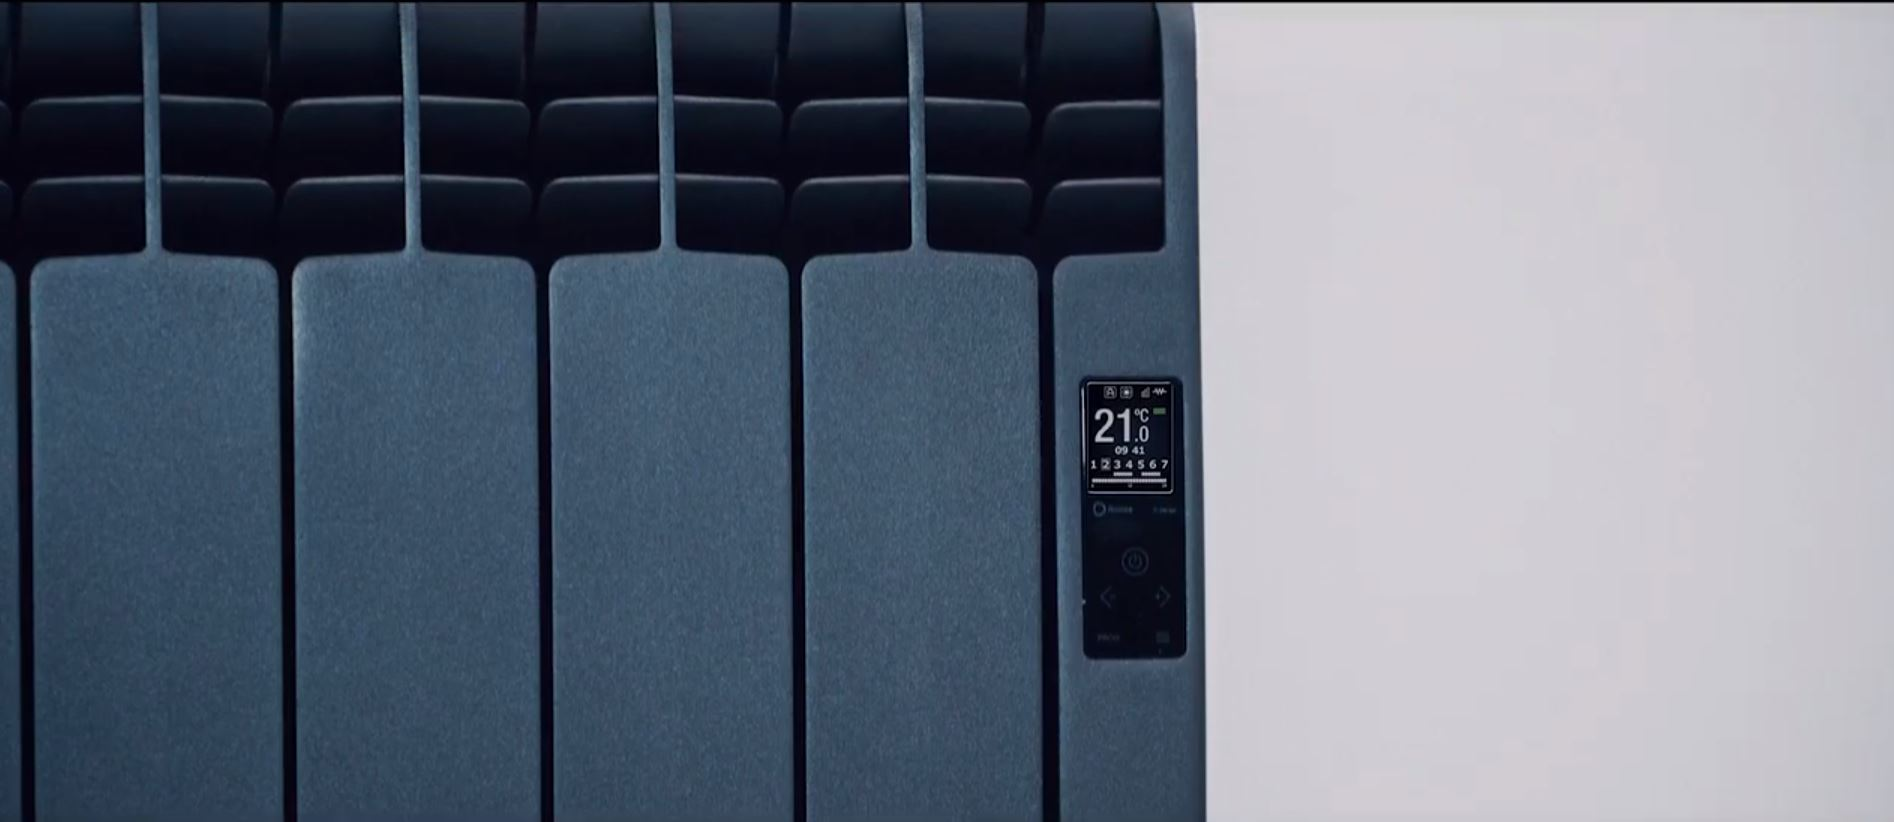 Rointe D Series black radiator close up of control panel